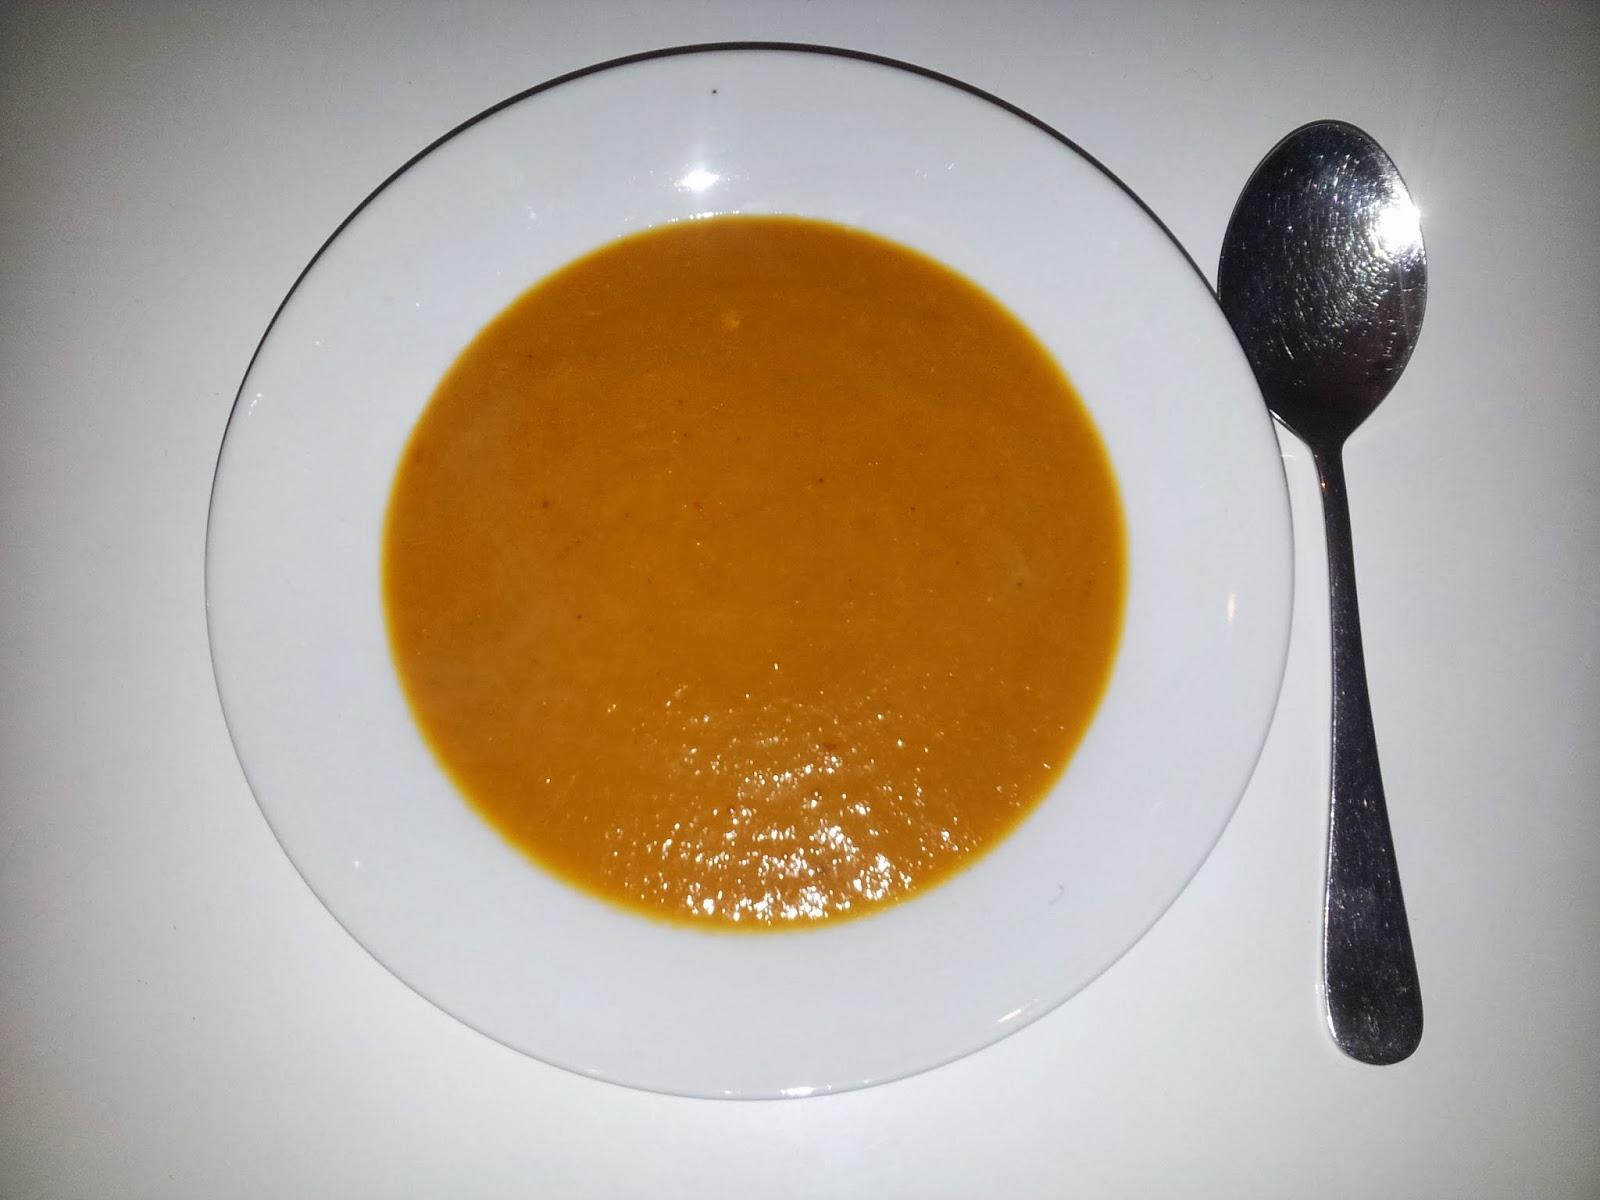 rikshospitalet suppekur